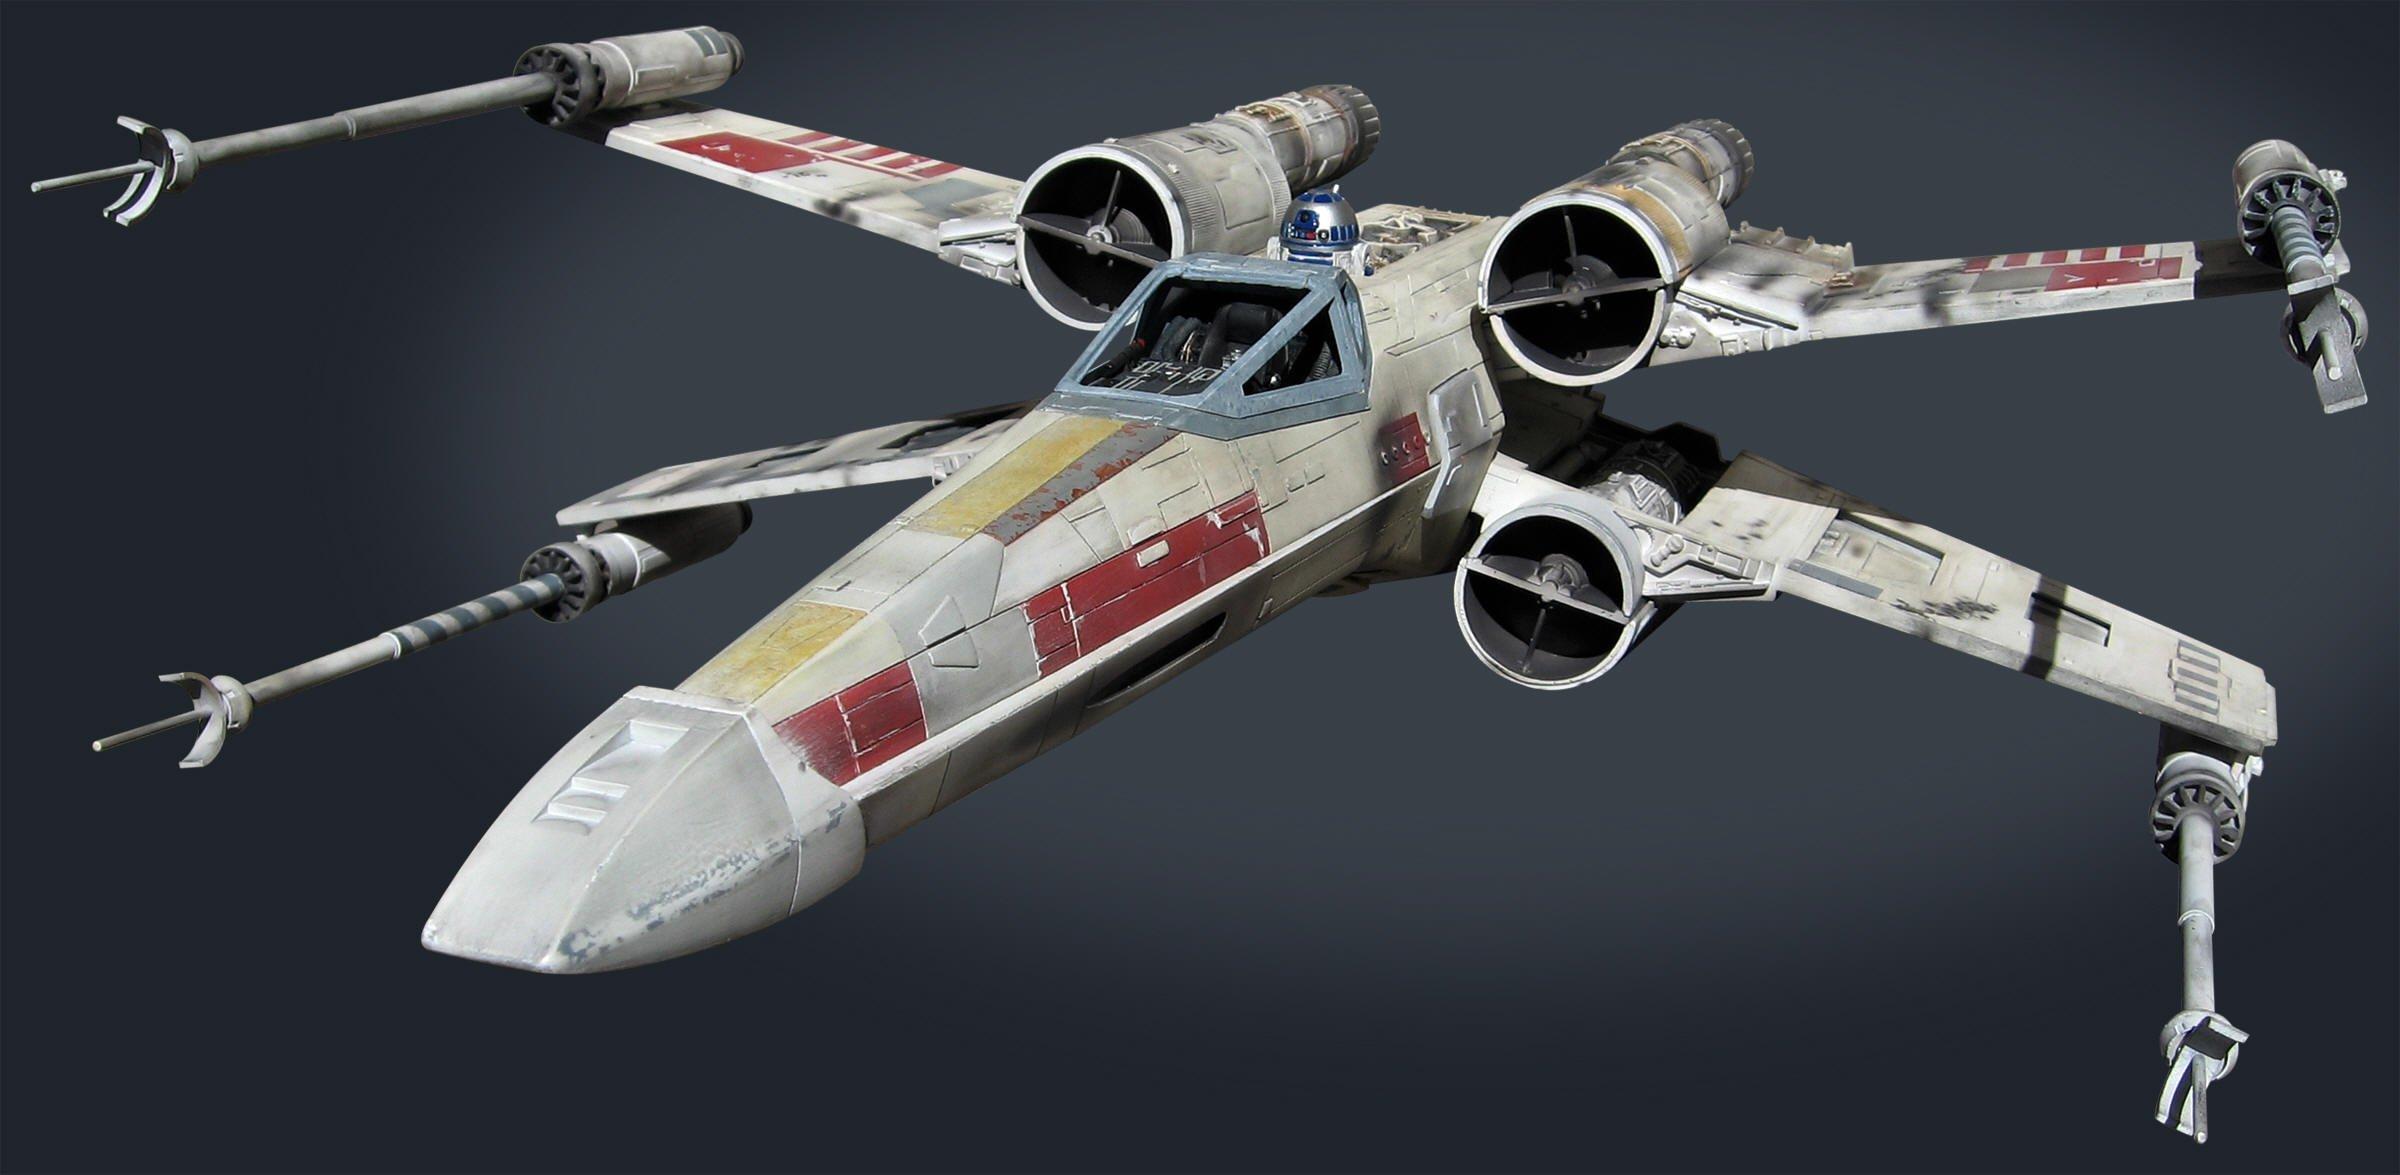 STAR WARS X  WING Spaceship Futuristic Space Sci Fi Xwing Wallpaper 2400x1175 811208